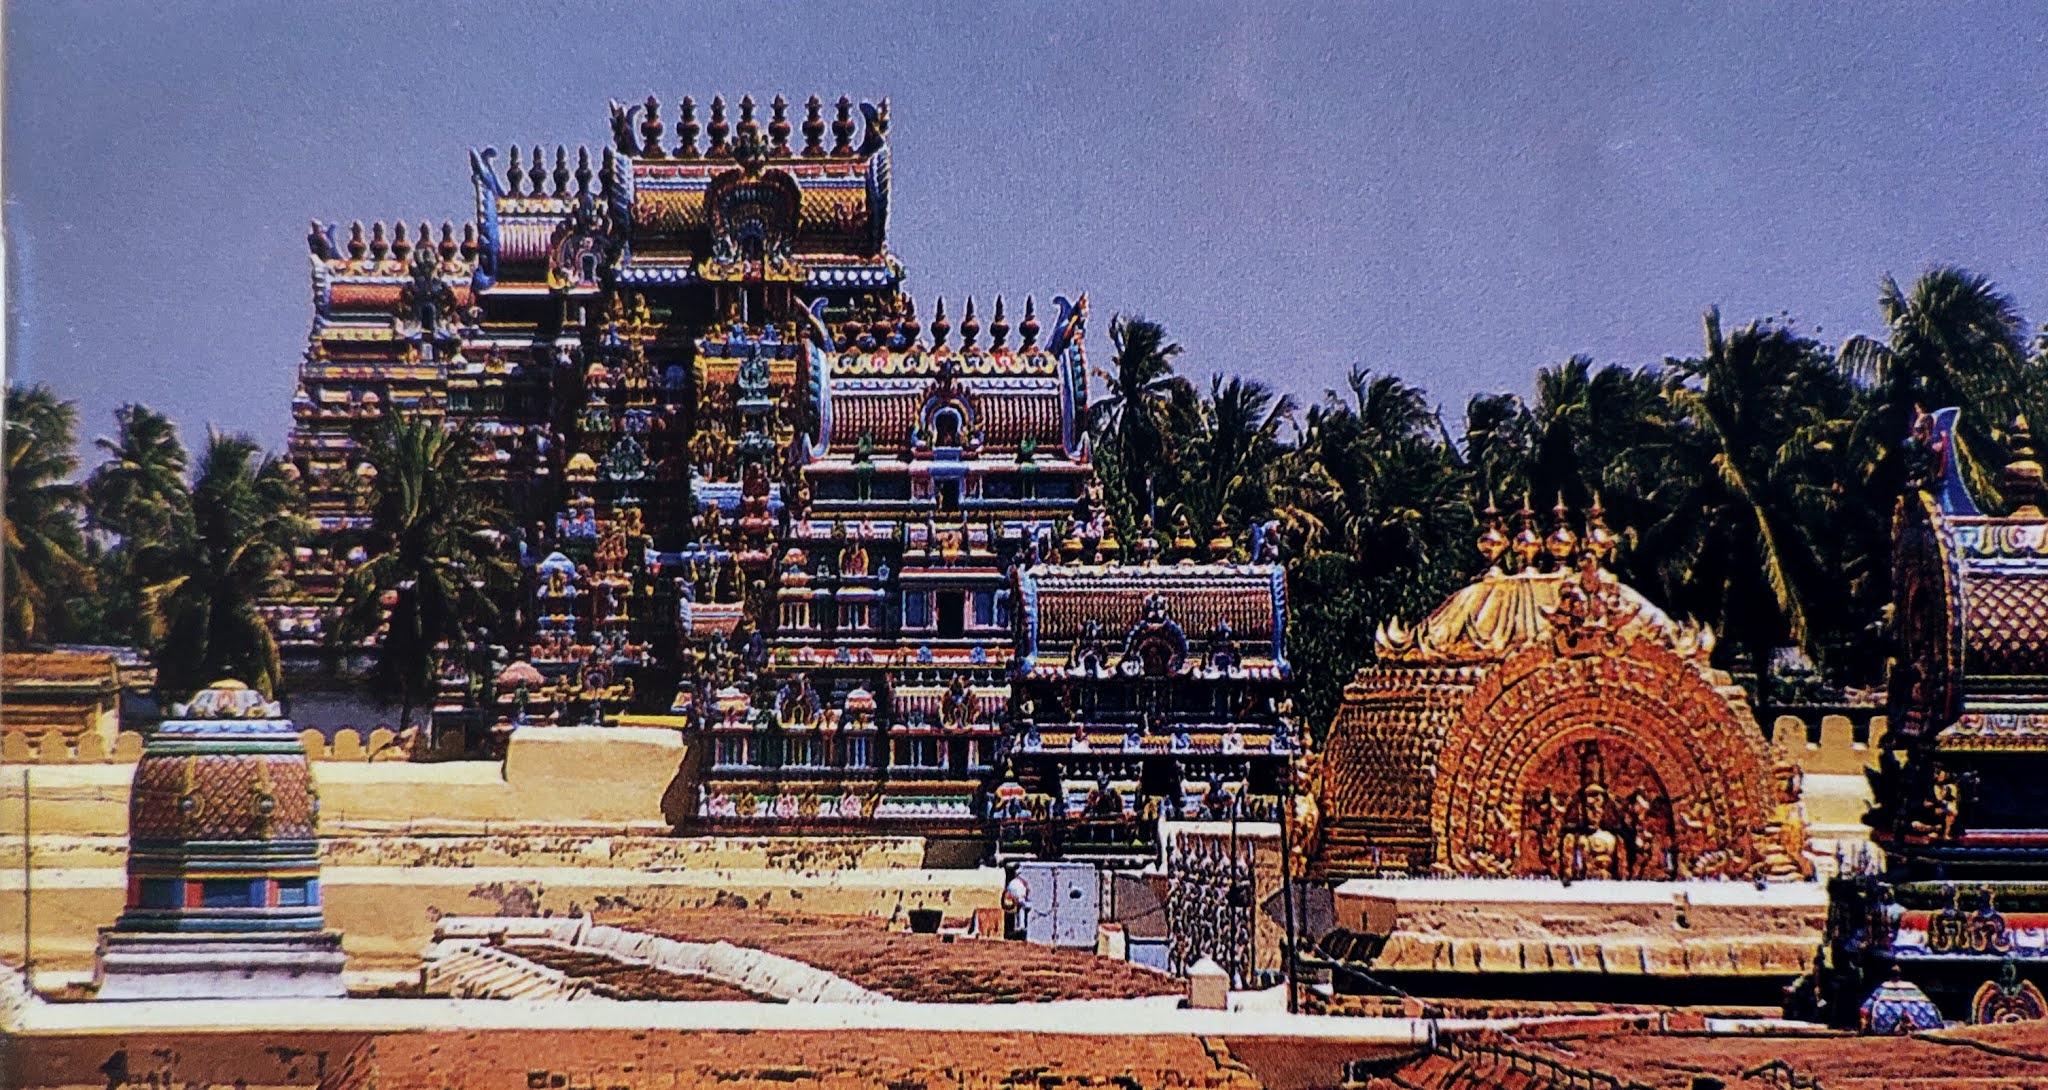 Image contains temple of tamil nadu srirangam